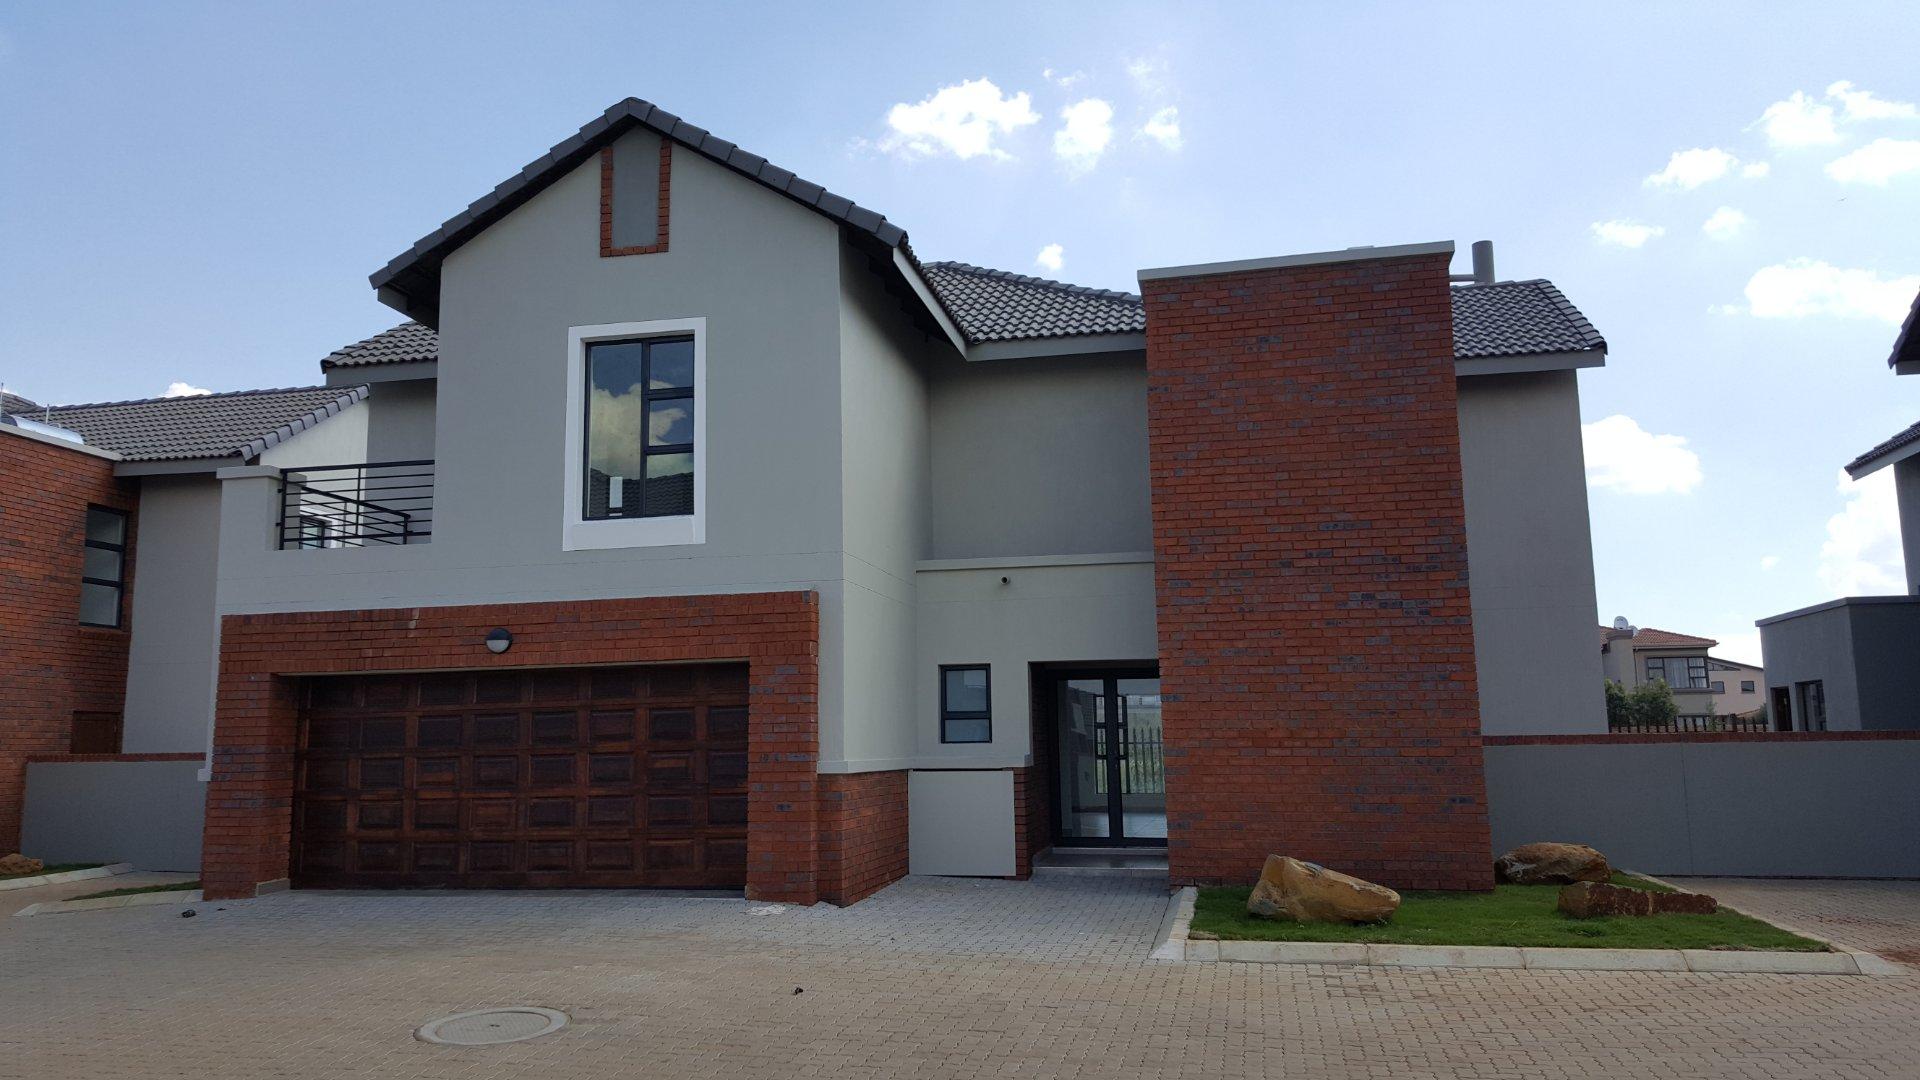 Alberton, Meyersdal Nature Estate Property  | Houses For Sale Meyersdal Nature Estate, Meyersdal Nature Estate, Townhouse 3 bedrooms property for sale Price:3,900,000